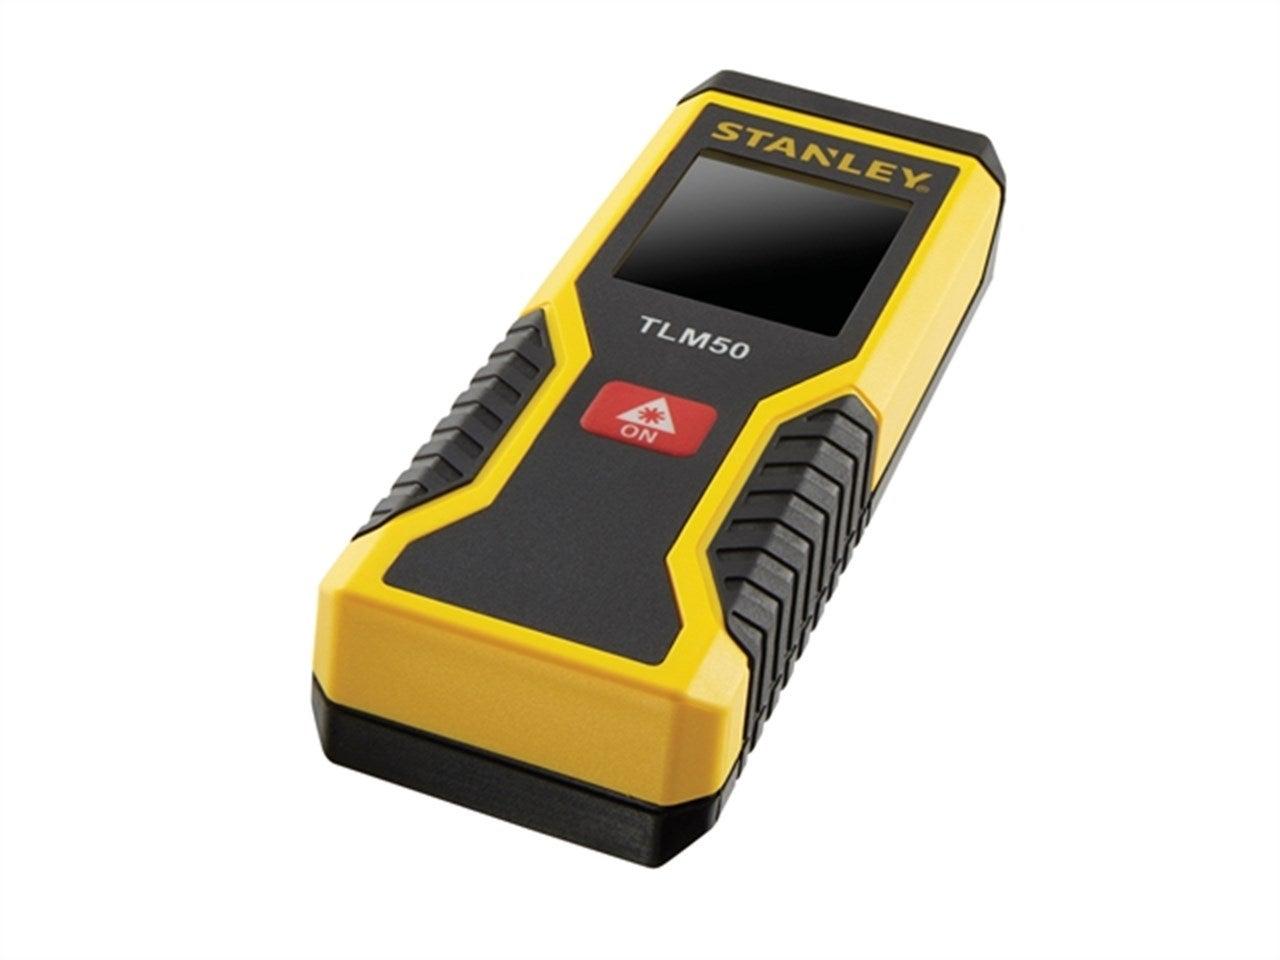 Télémètre Laser Stanley Tlm50 Stht1 77409 15 M